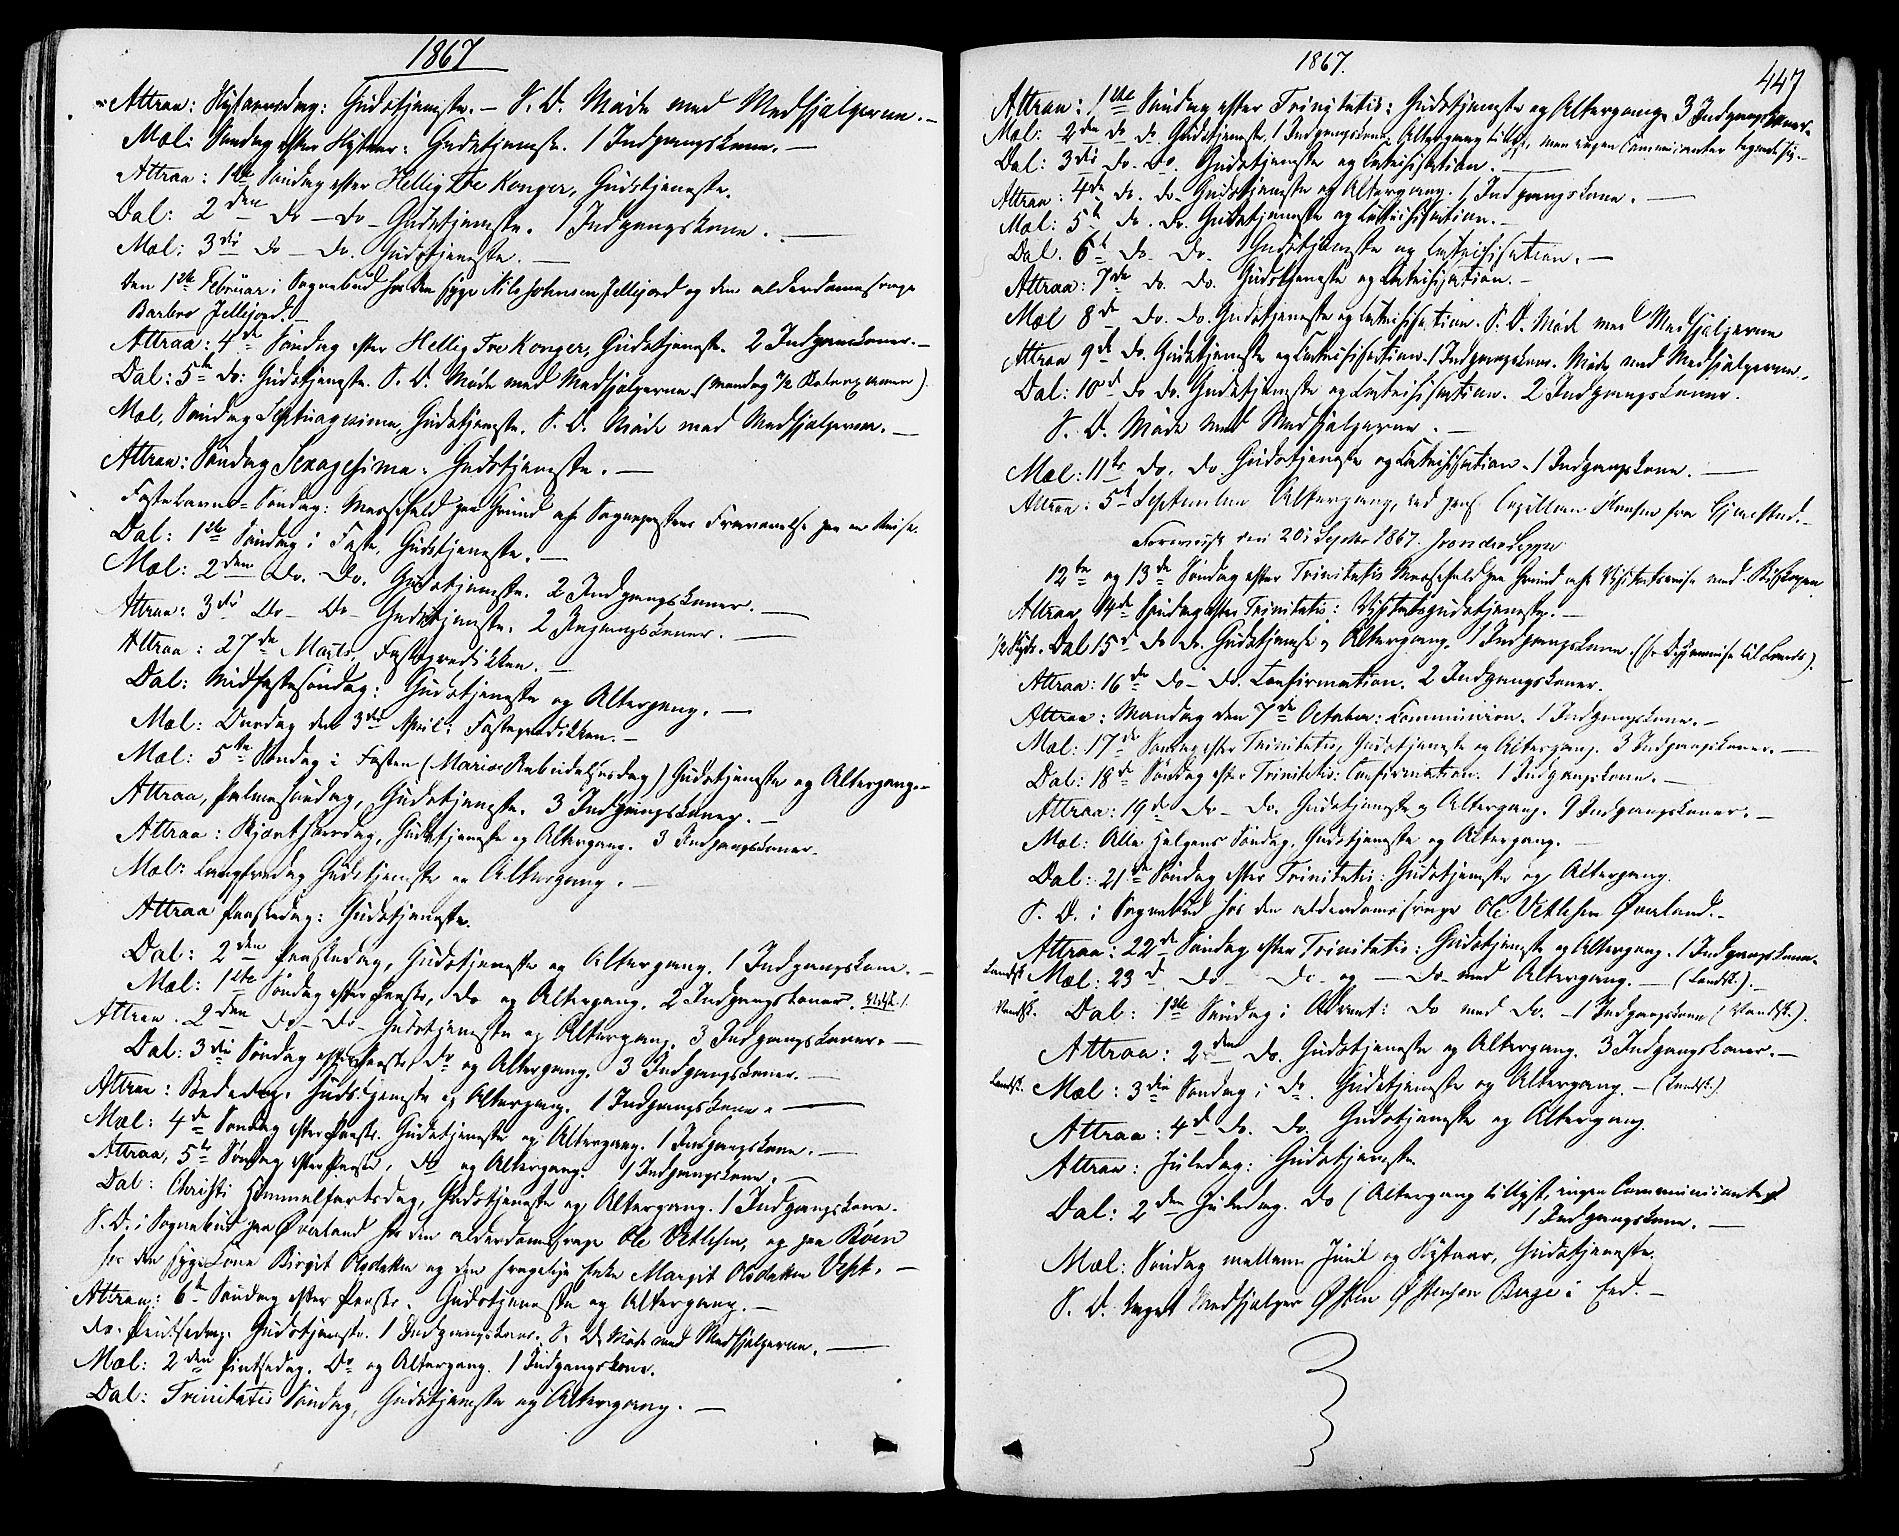 SAKO, Tinn kirkebøker, F/Fa/L0006: Ministerialbok nr. I 6, 1857-1878, s. 447